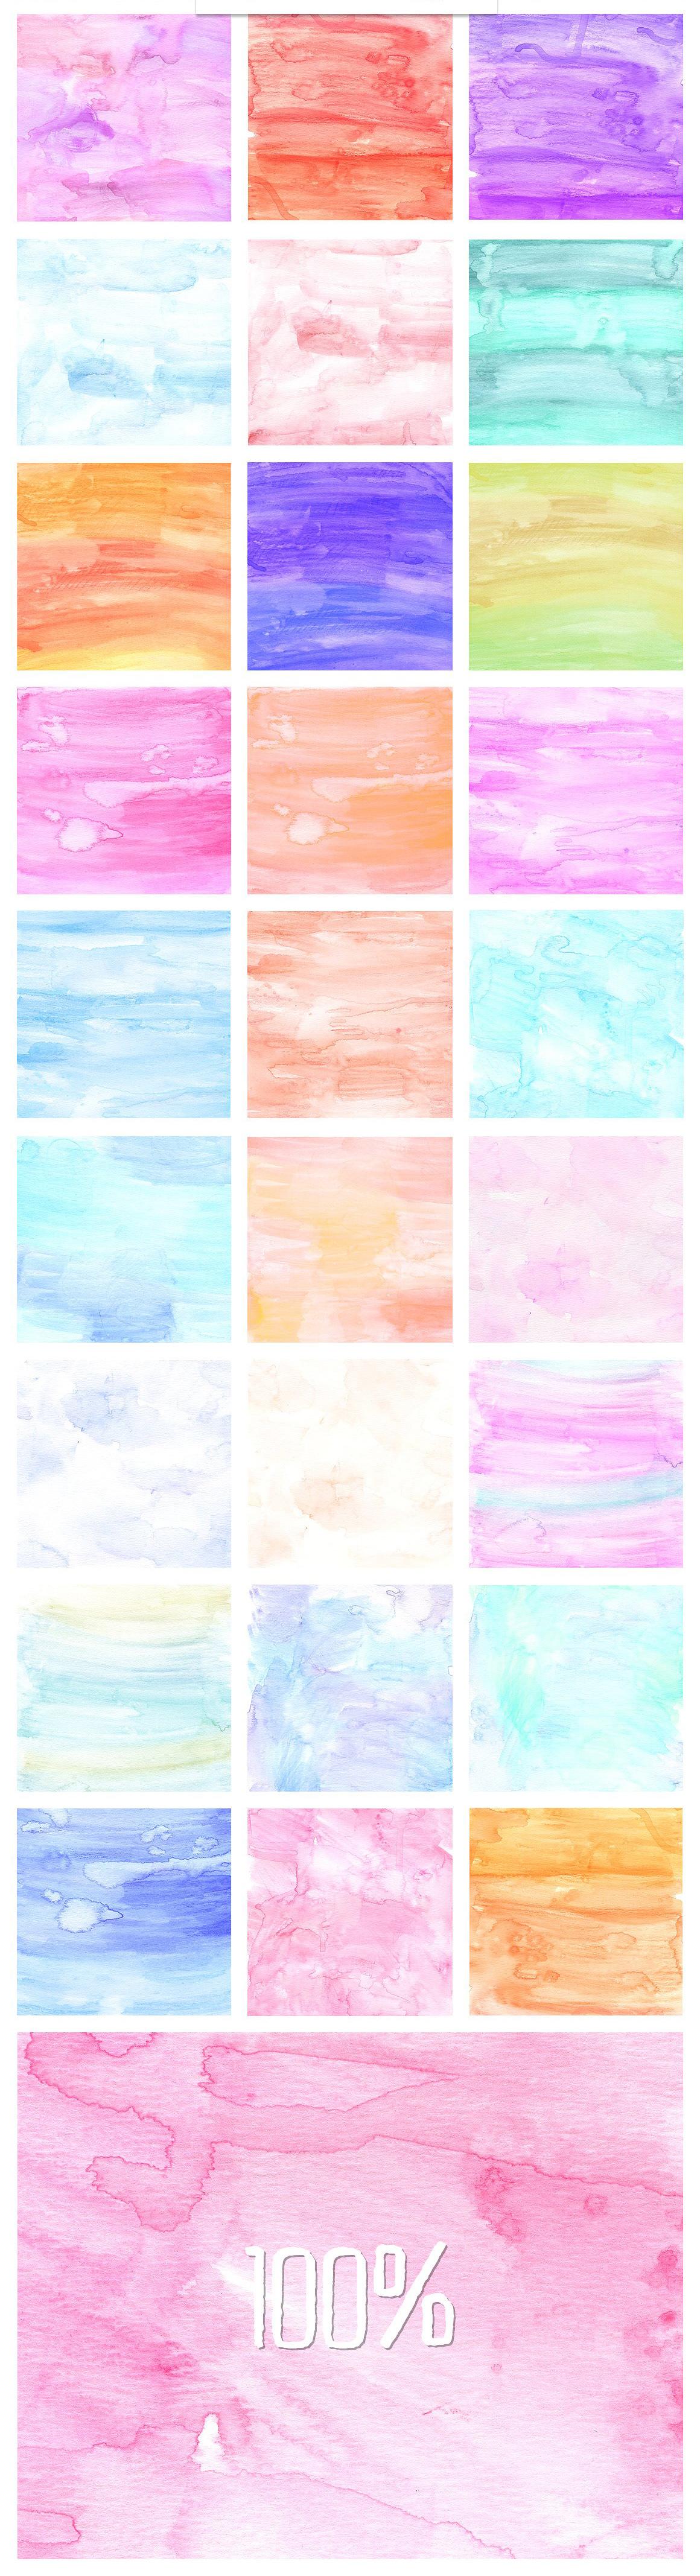 33 Free Handmade Digital Watercolor Paper Textures On Behance